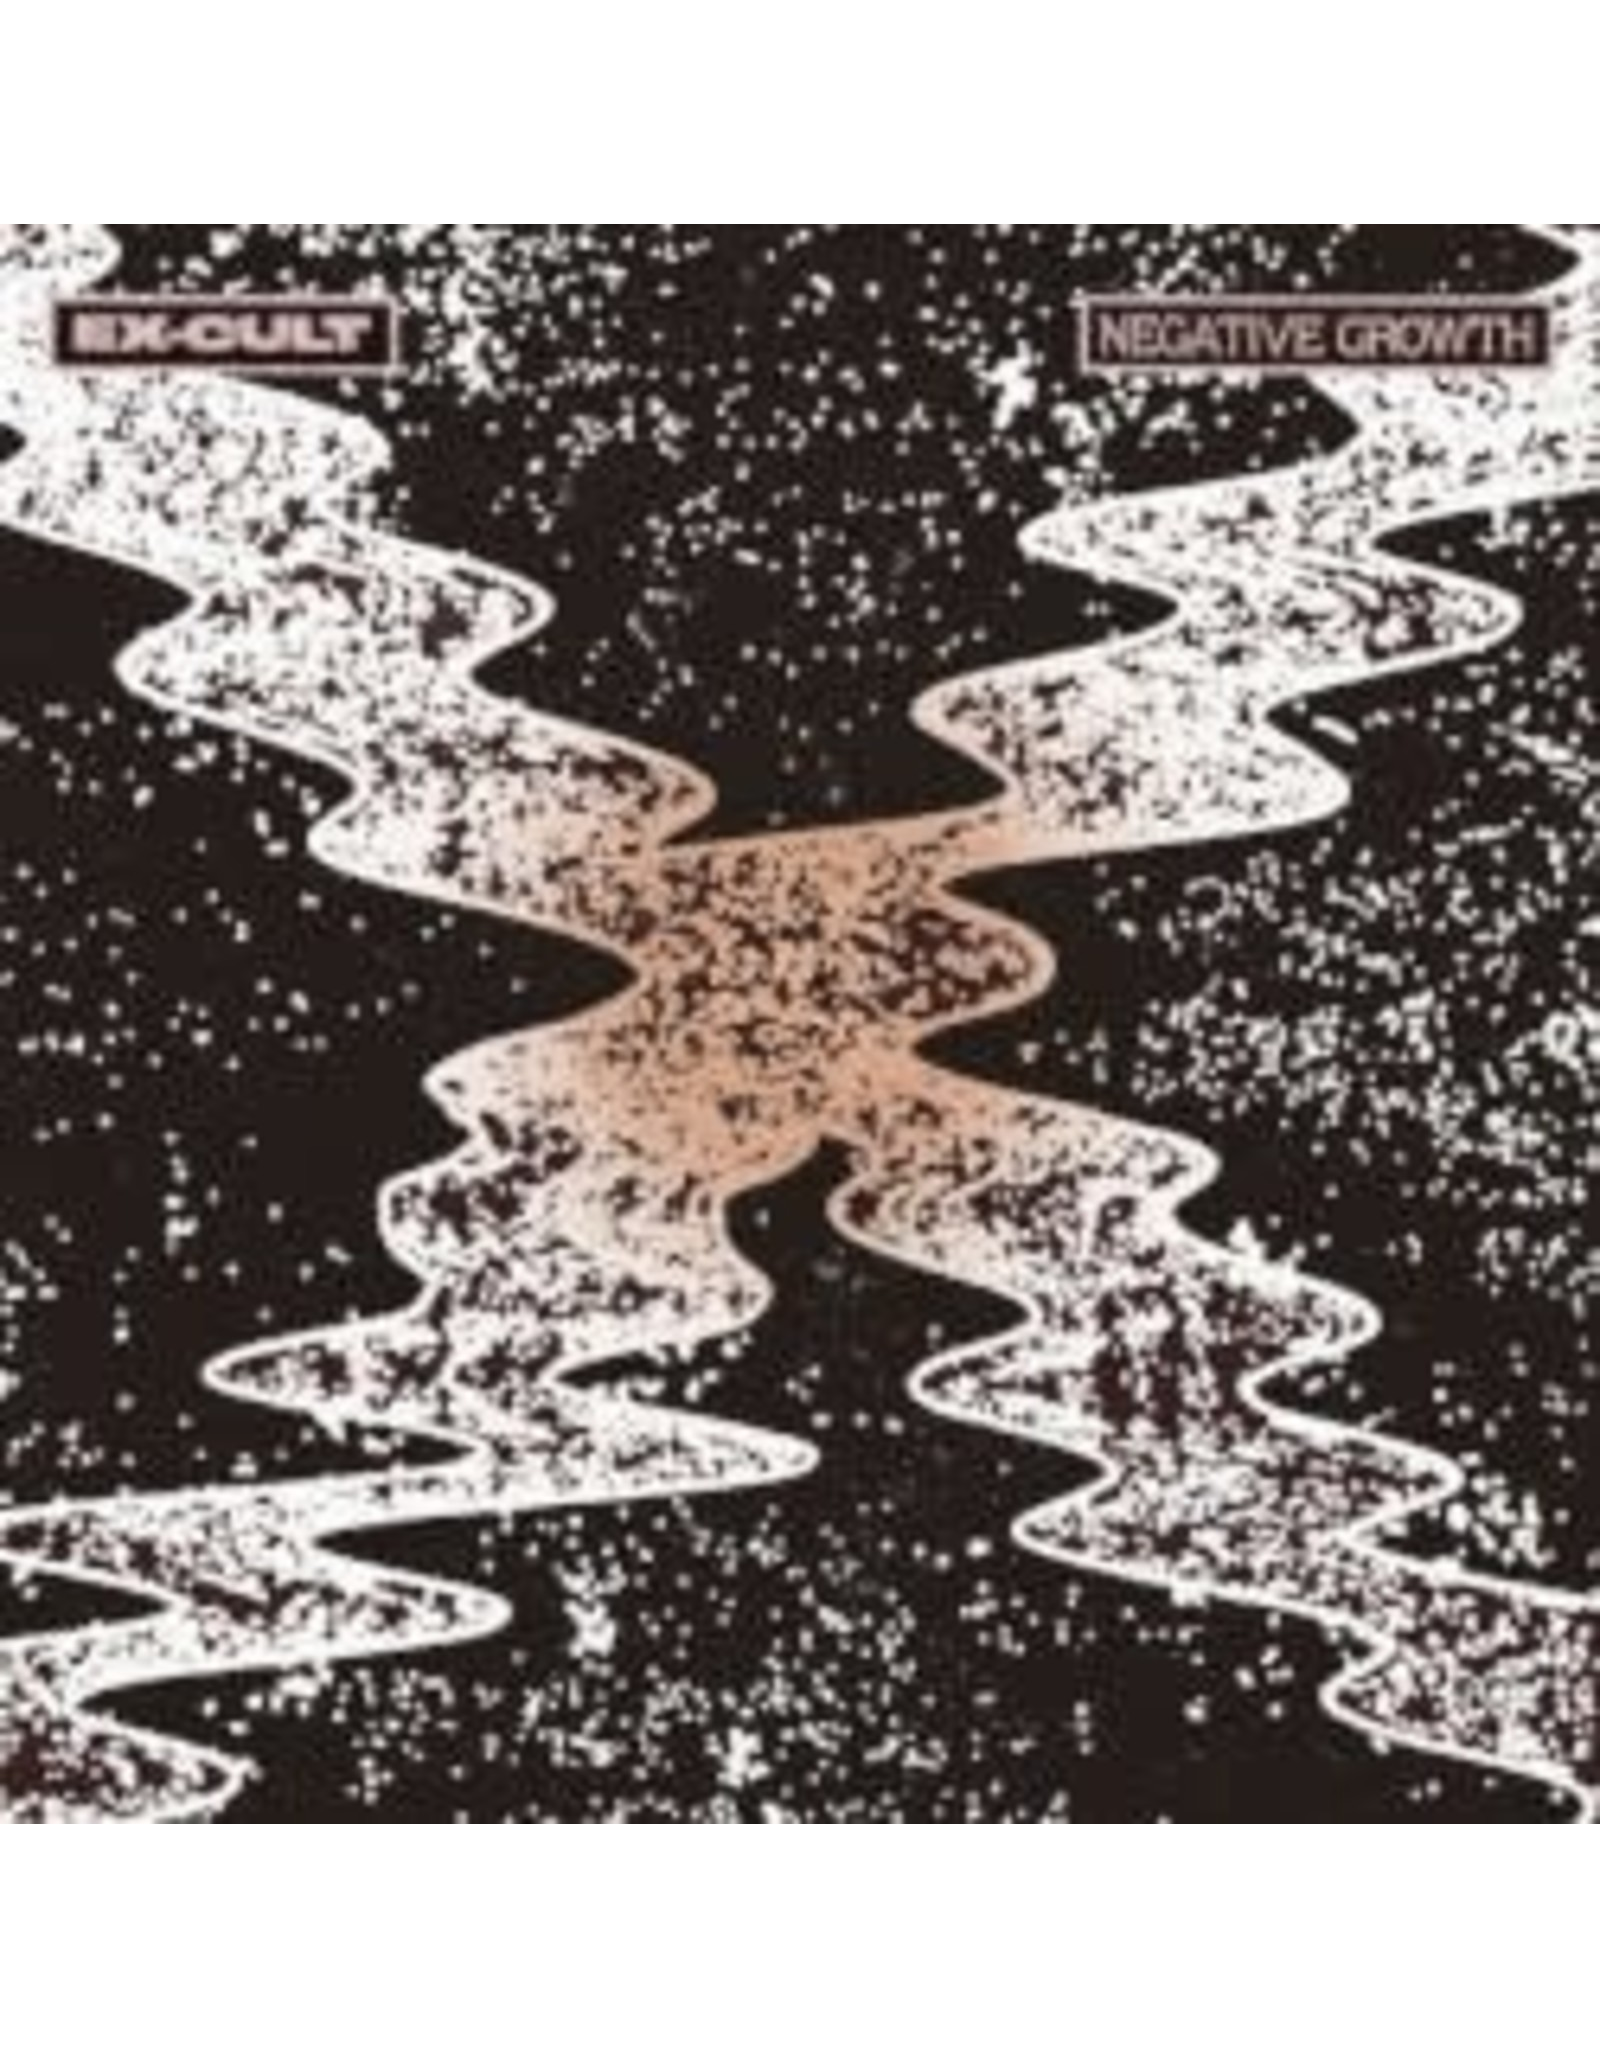 Ex-Cult - Negative Growth LP